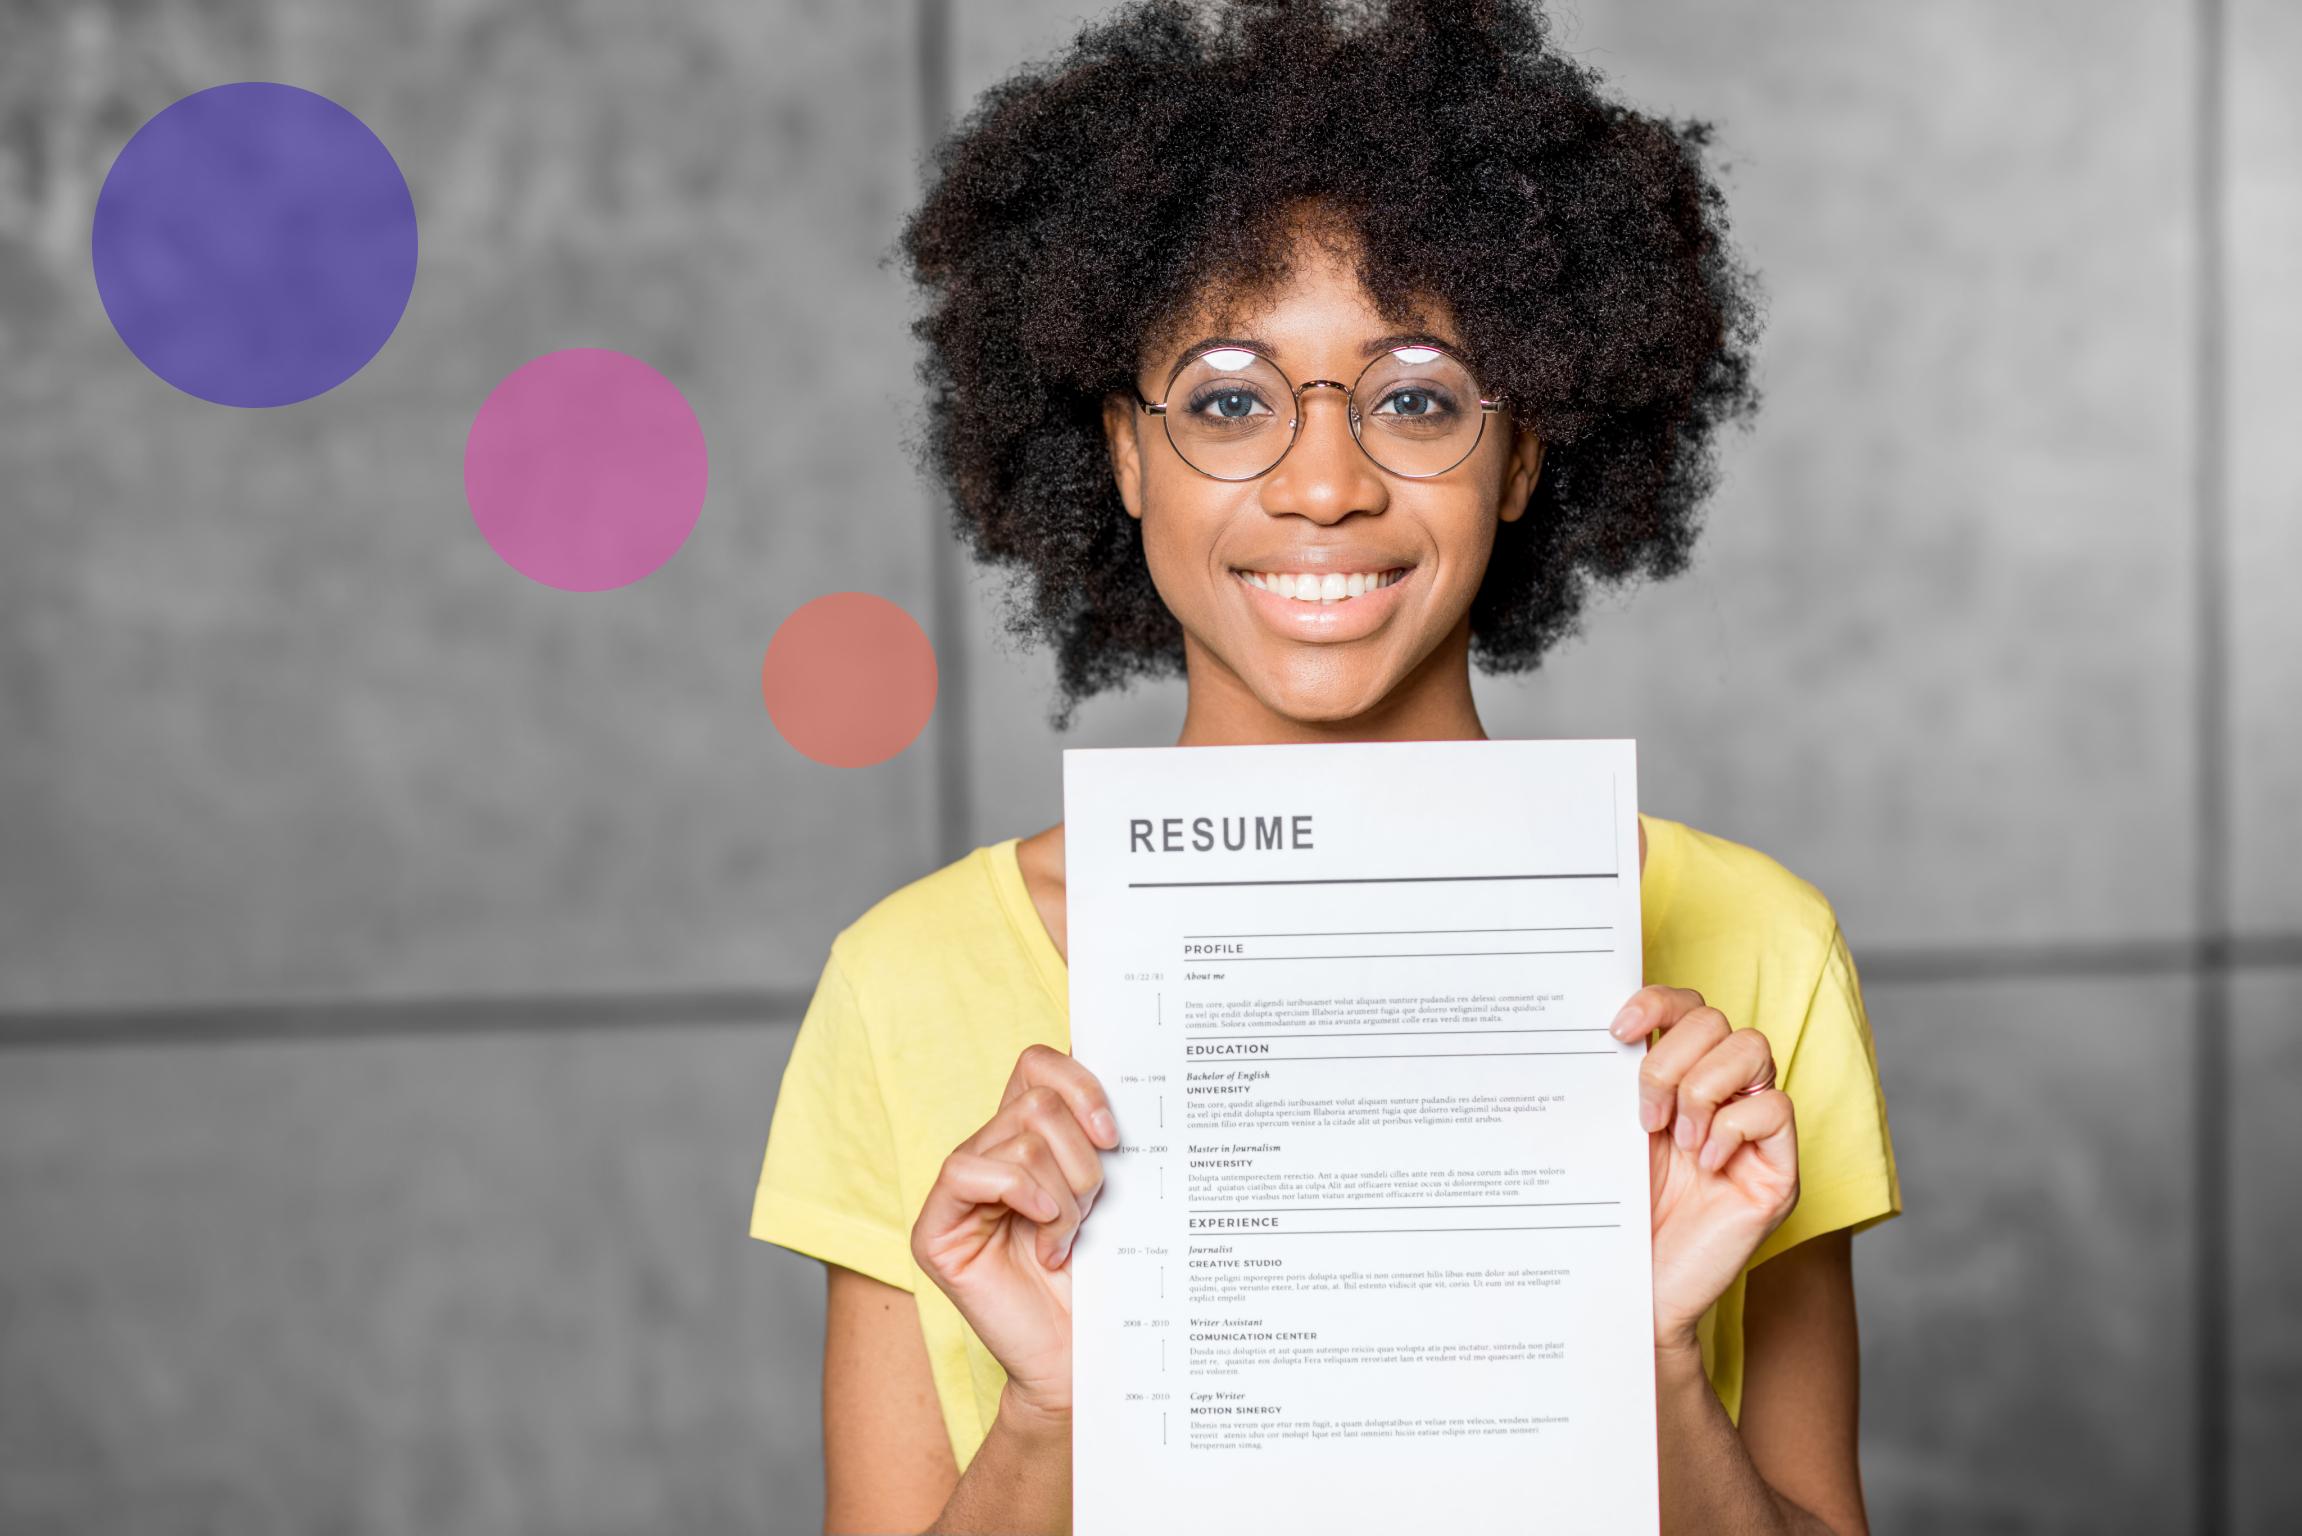 Choosing the best Google Docs resume template